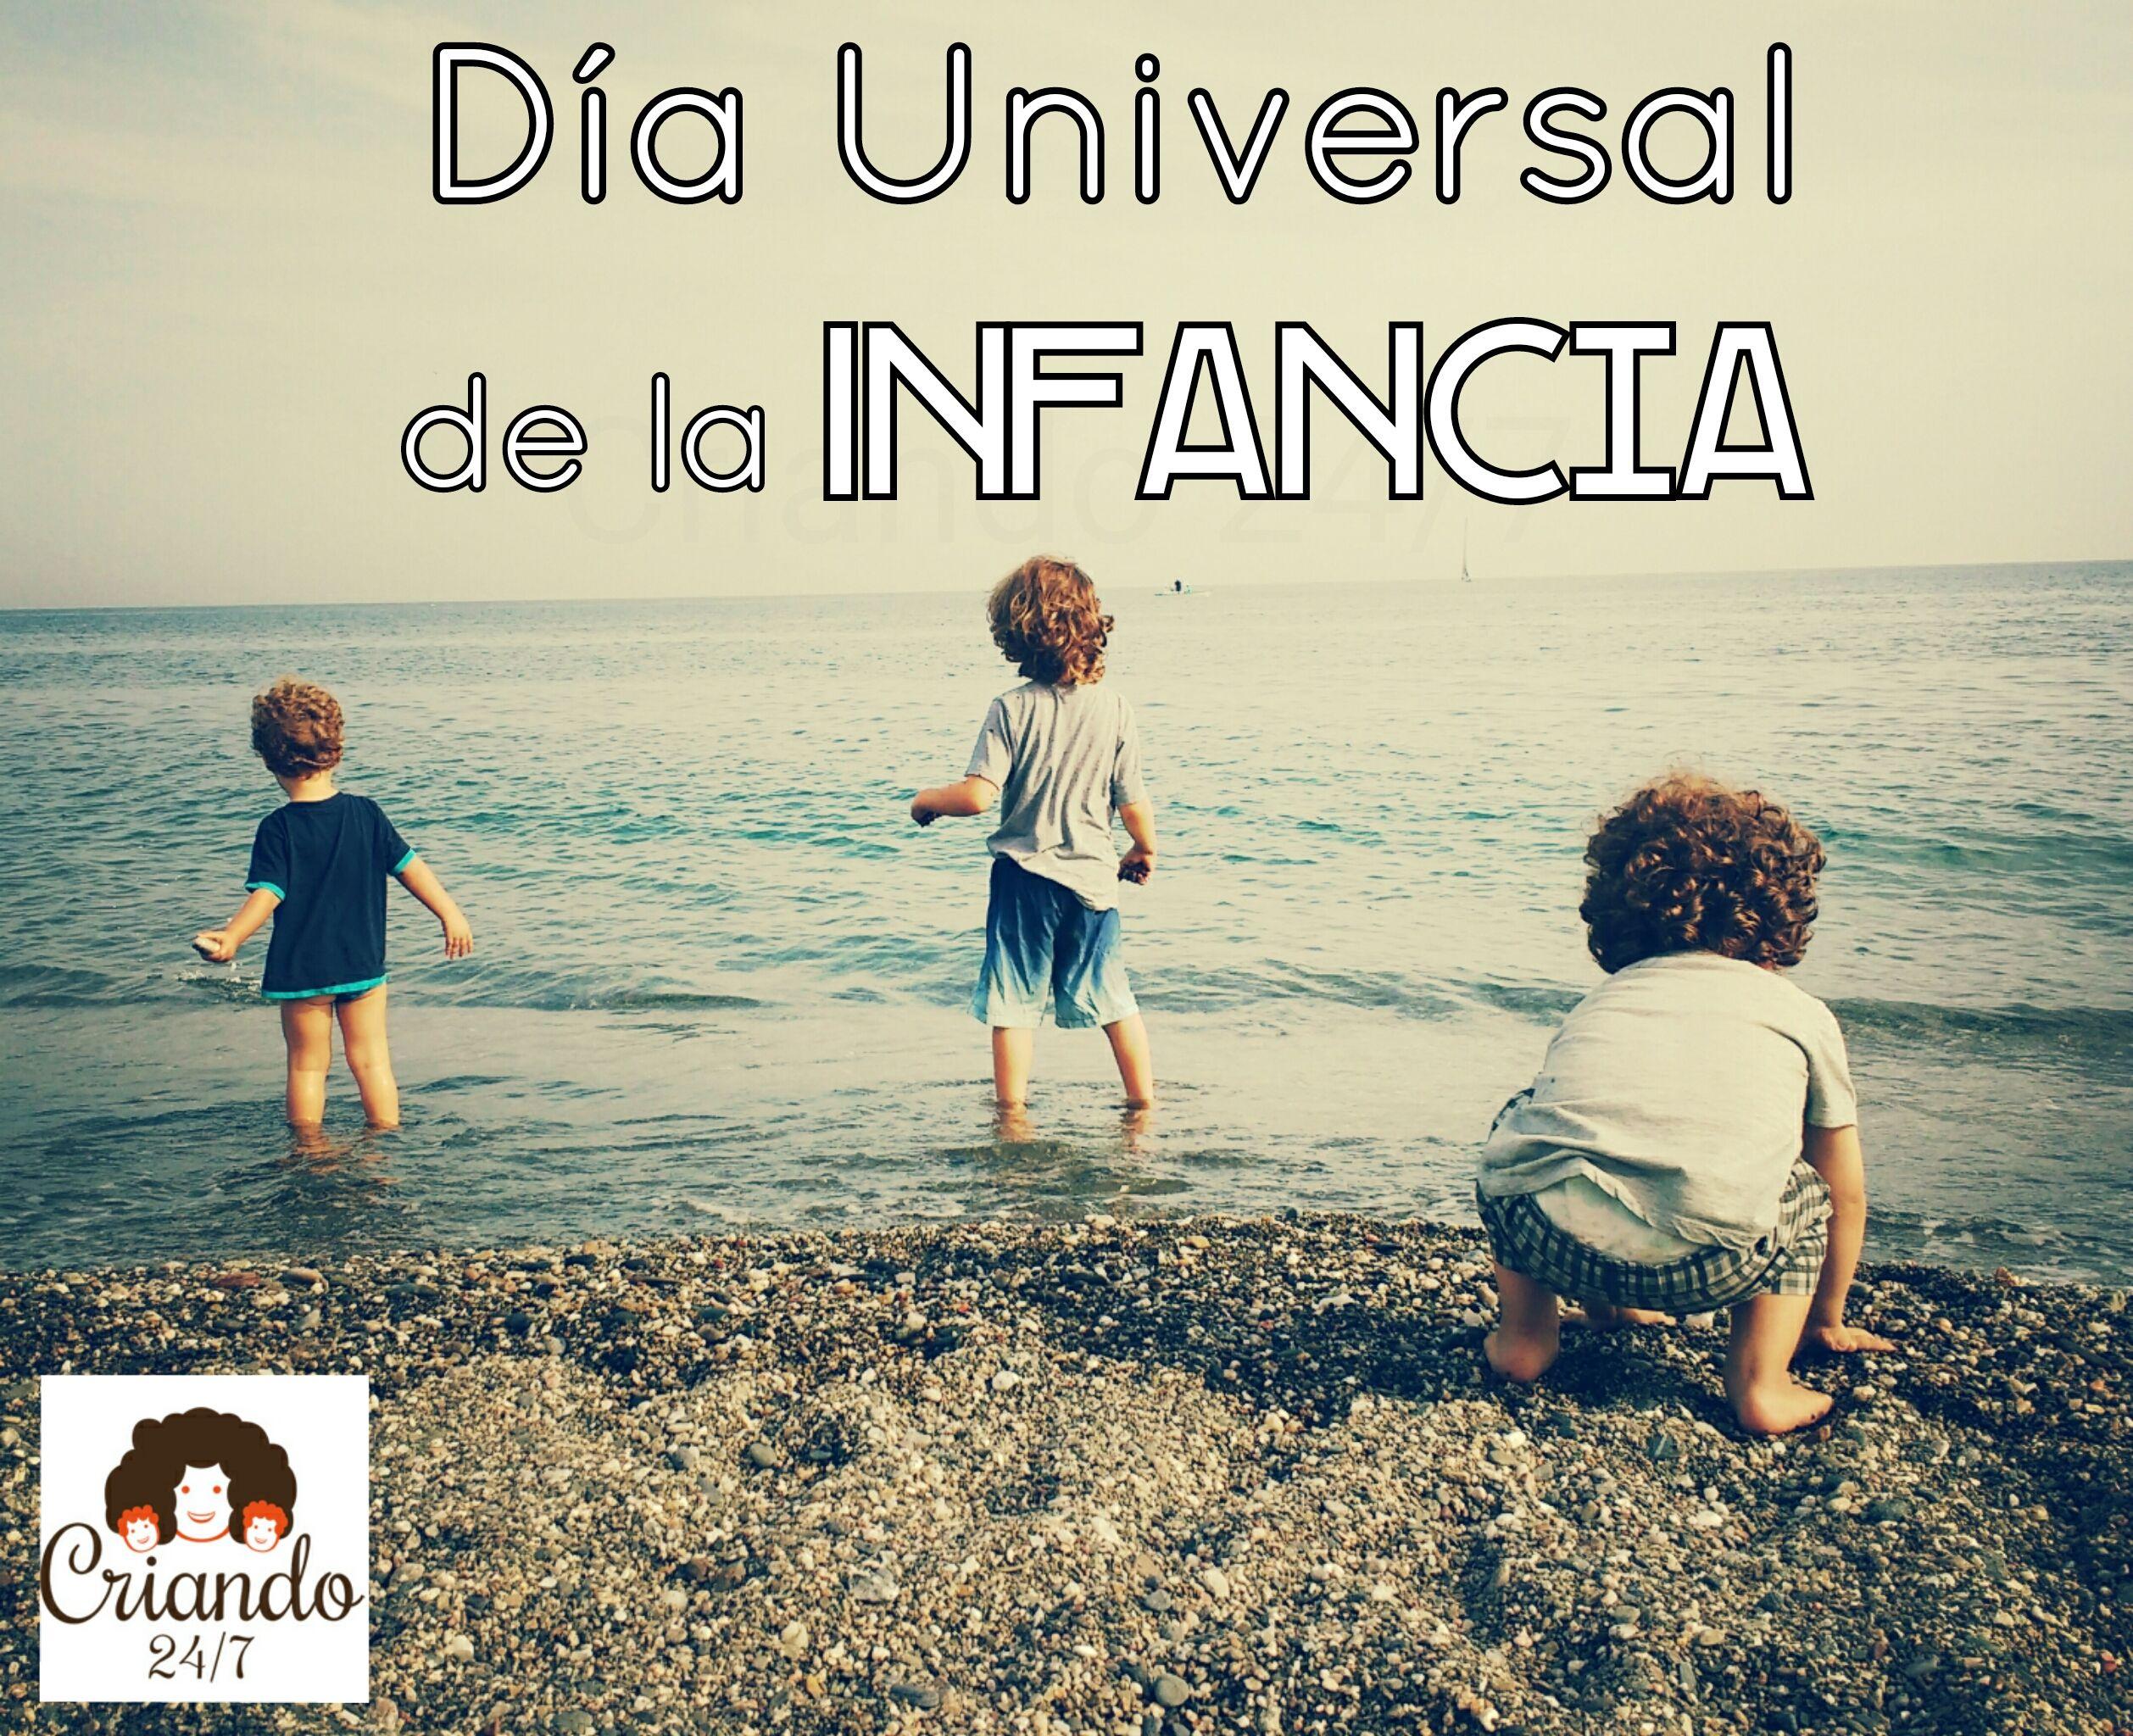 criando247-dia-universal-de-la-infancia